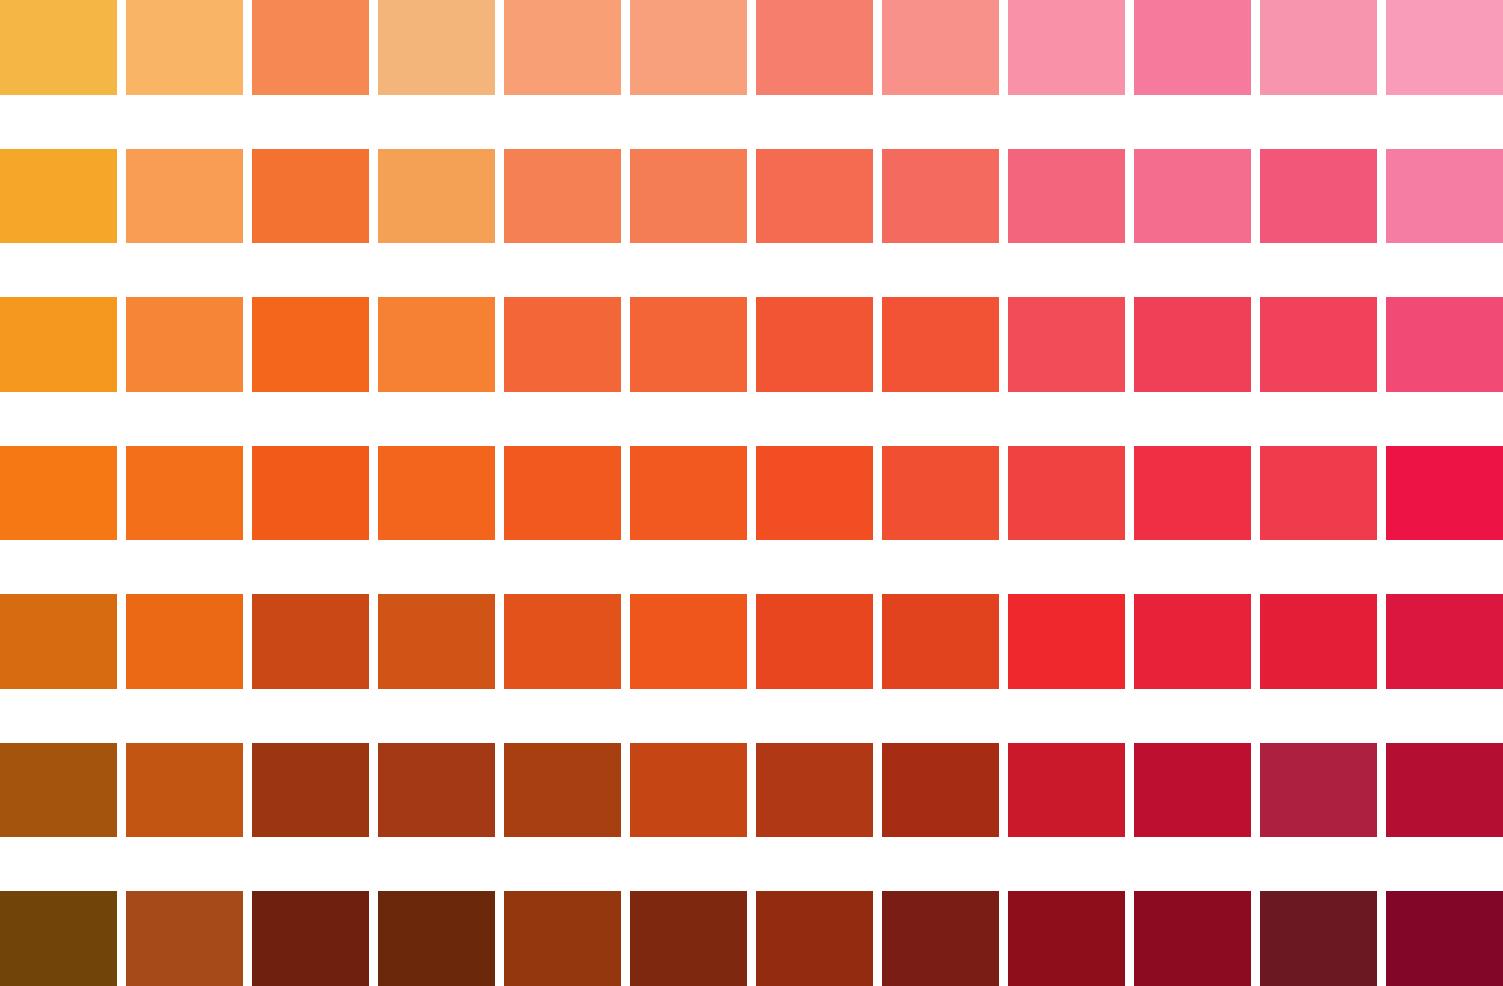 Free Pantone Color Chart - PDF   68KB   14 Page(s)   Page 2